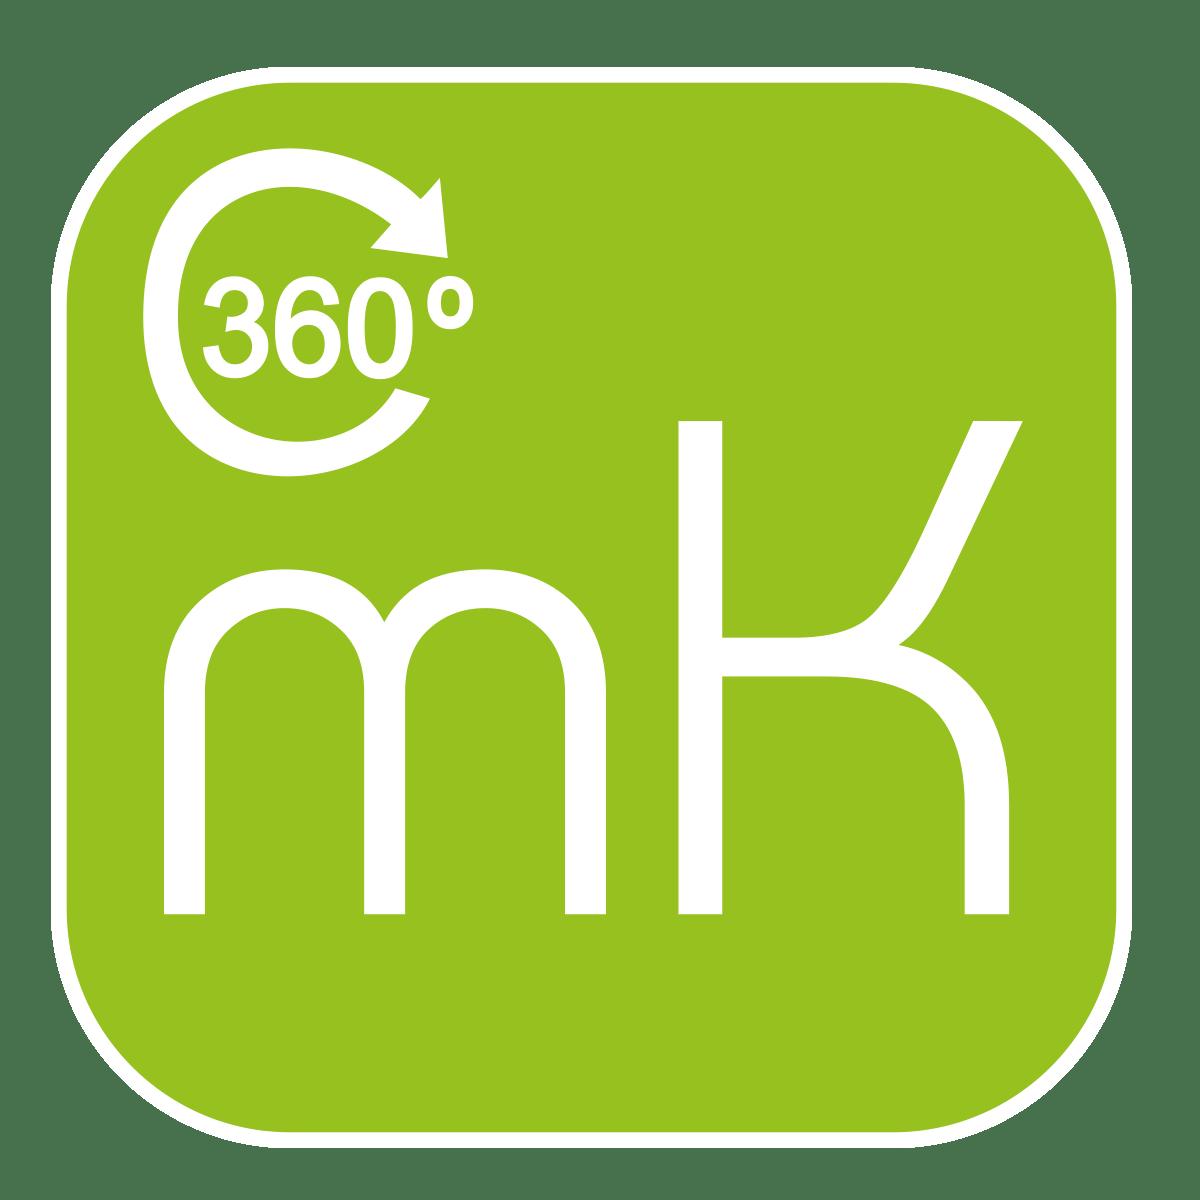 MK Fotografie | Fotopanoramen